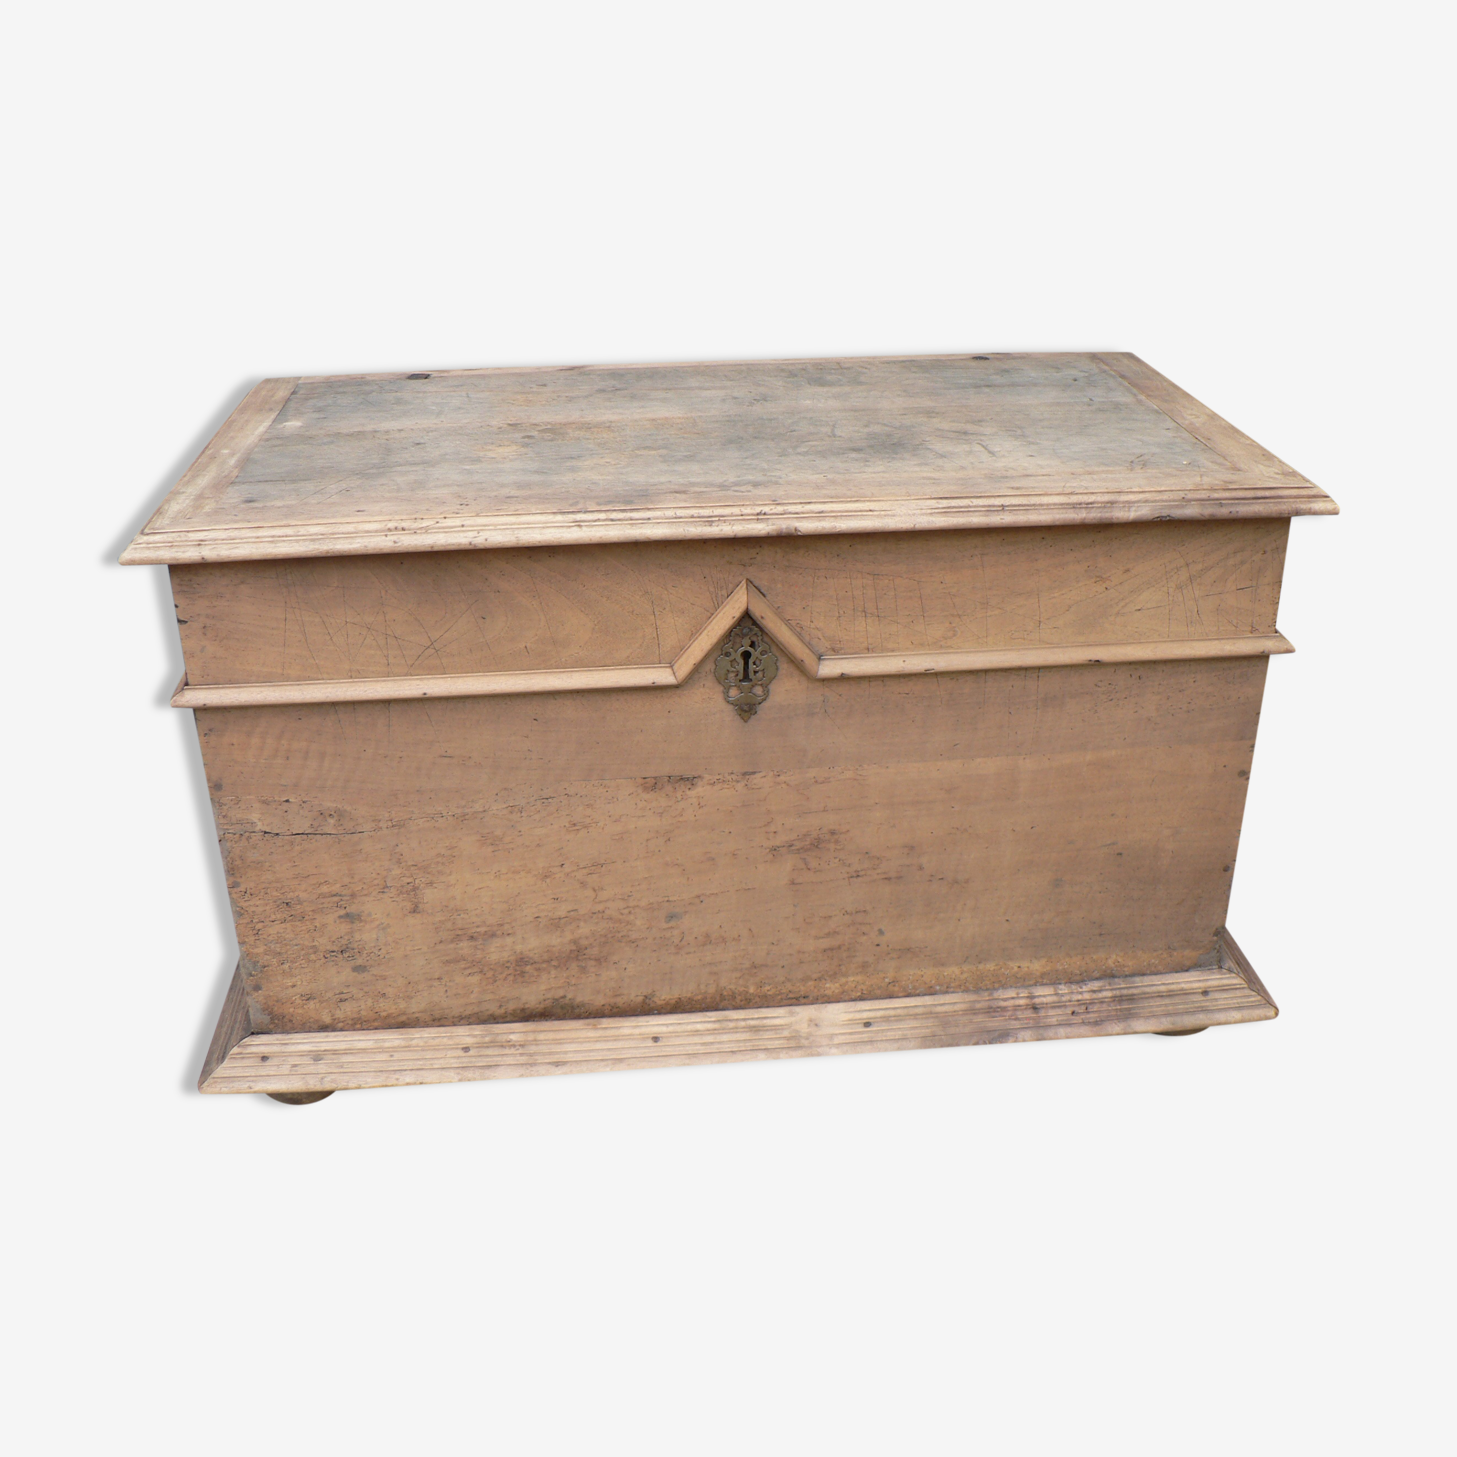 Pickled storage trunk